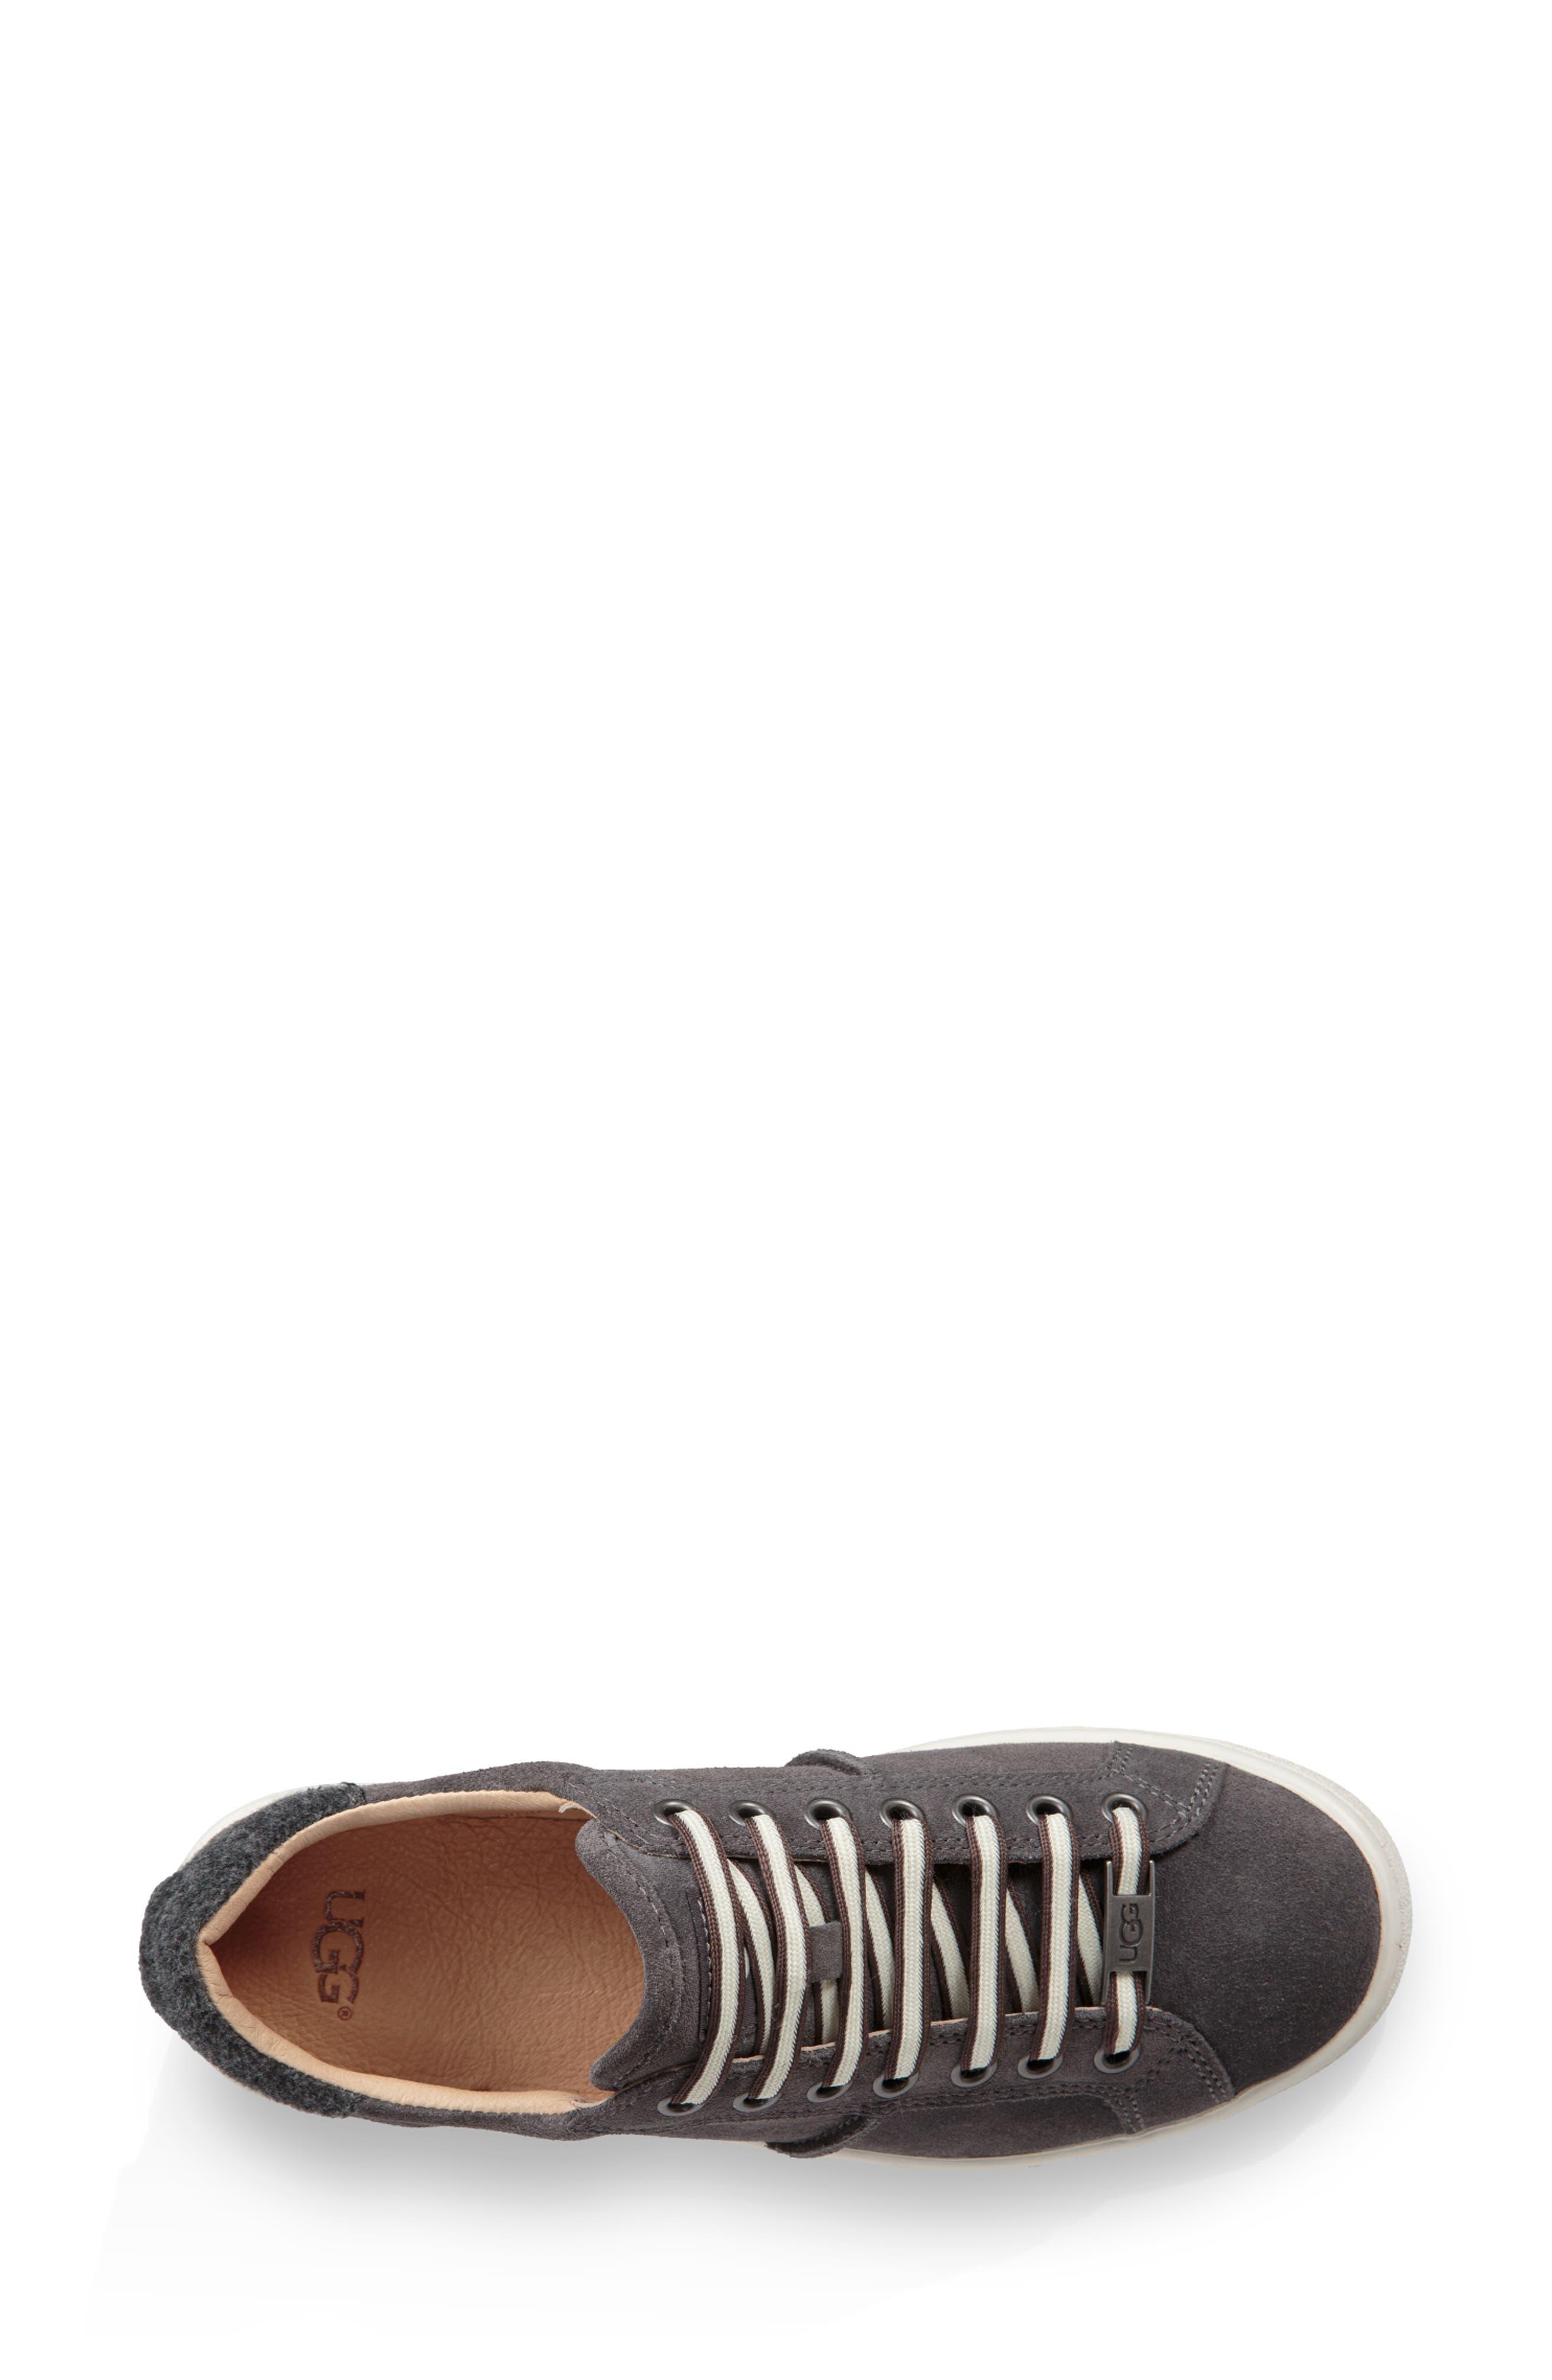 Milo Sneaker,                             Alternate thumbnail 4, color,                             CHARCOAL SUEDE